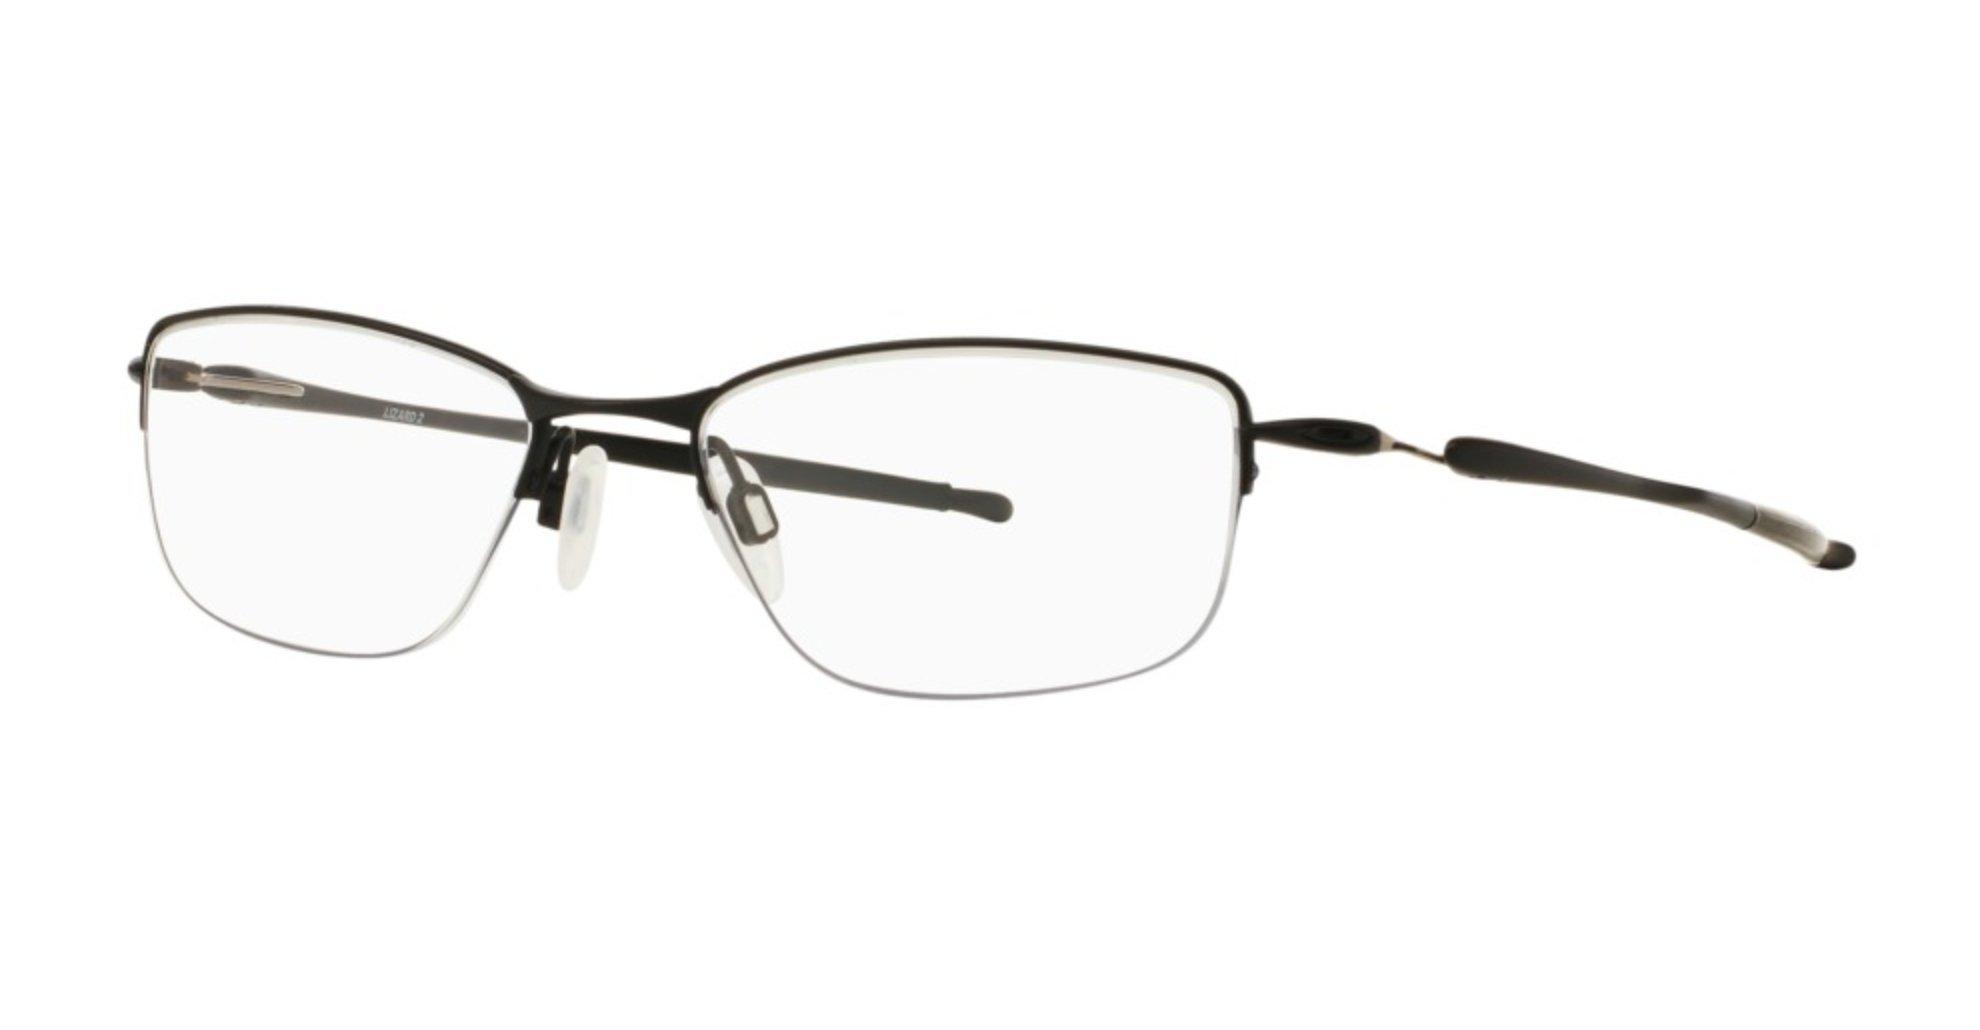 81de7128cf Oakley Rx Titanium Eyeglasses - Lizard OX5120-0354 - Satin Black